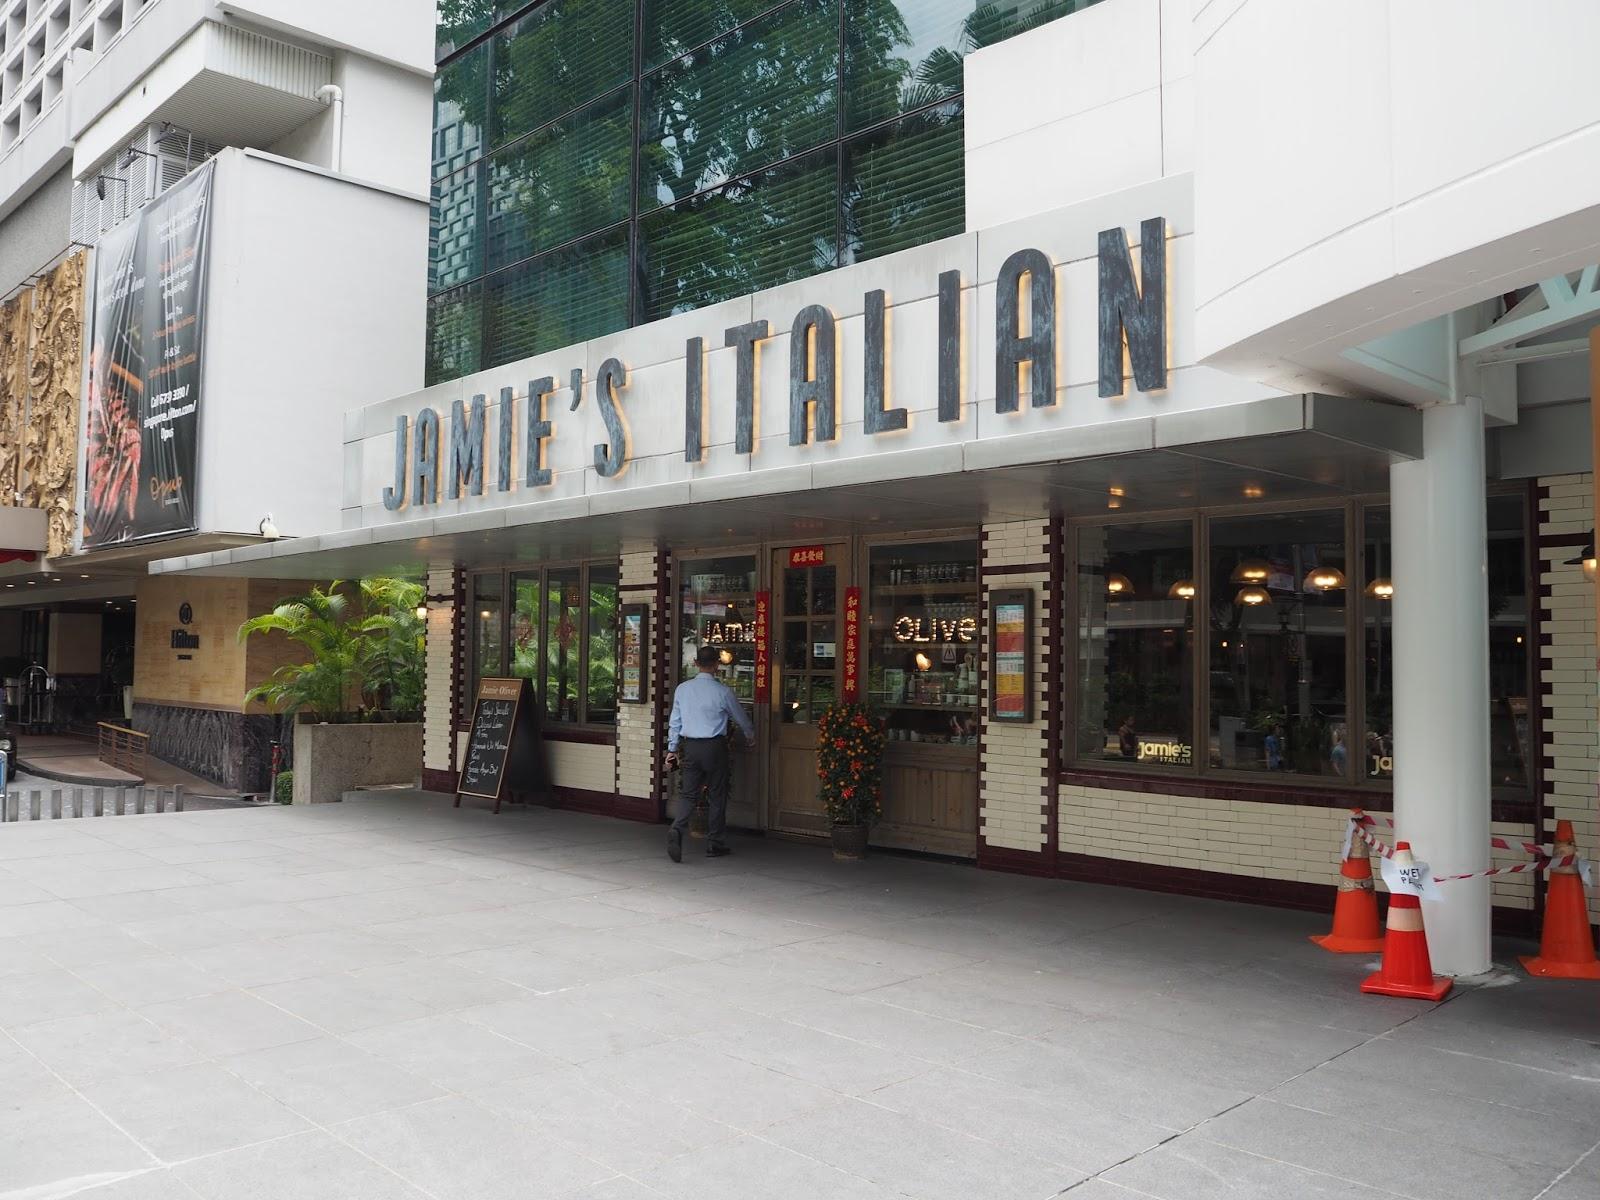 Jamies Italian Forum The Shopping Mall 583 Orchard Rd Singapore 238884 Phone 65 6655 7676